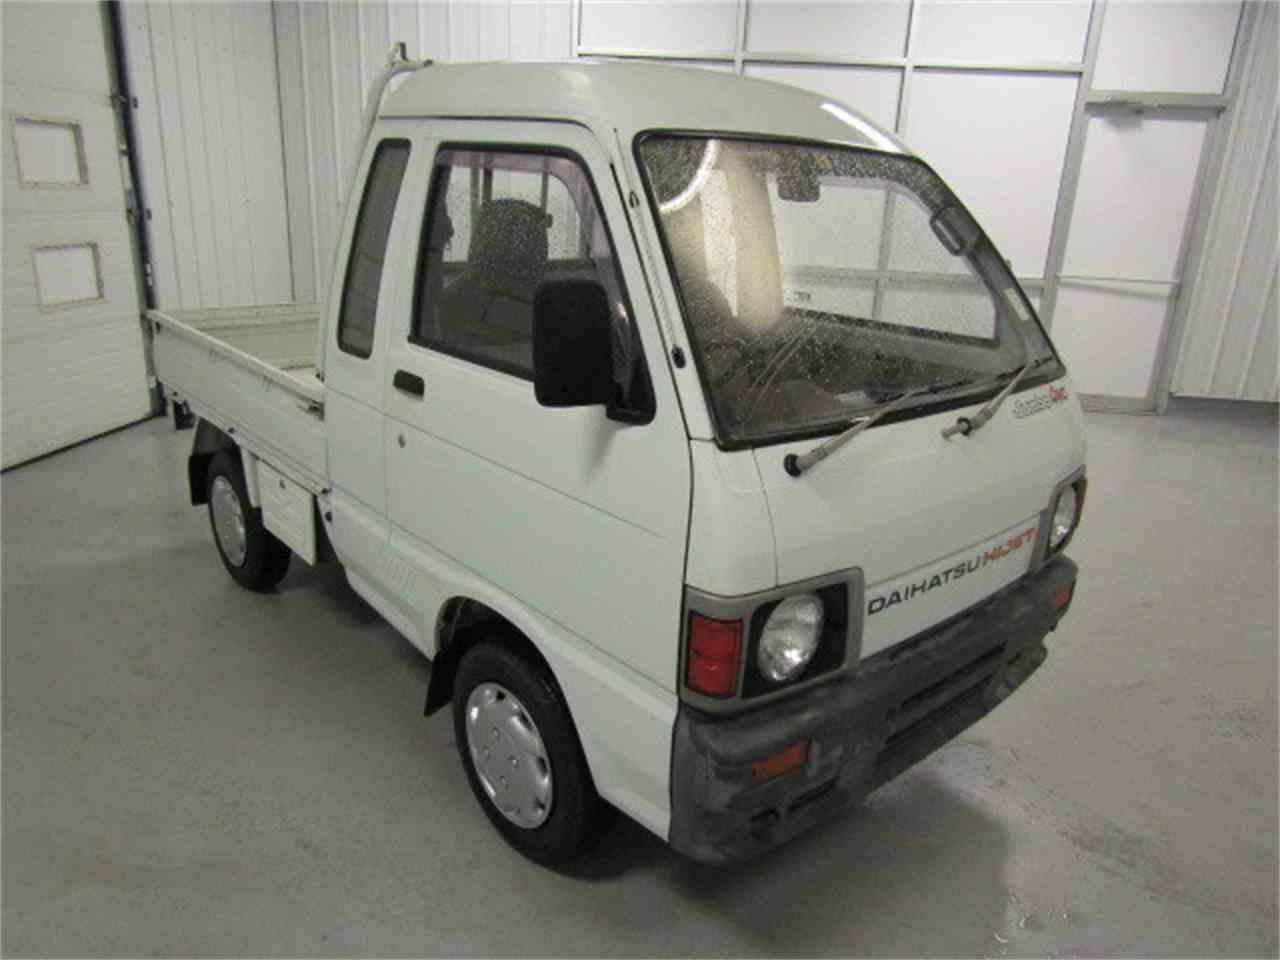 1988 Daihatsu HiJet for Sale - CC-990146